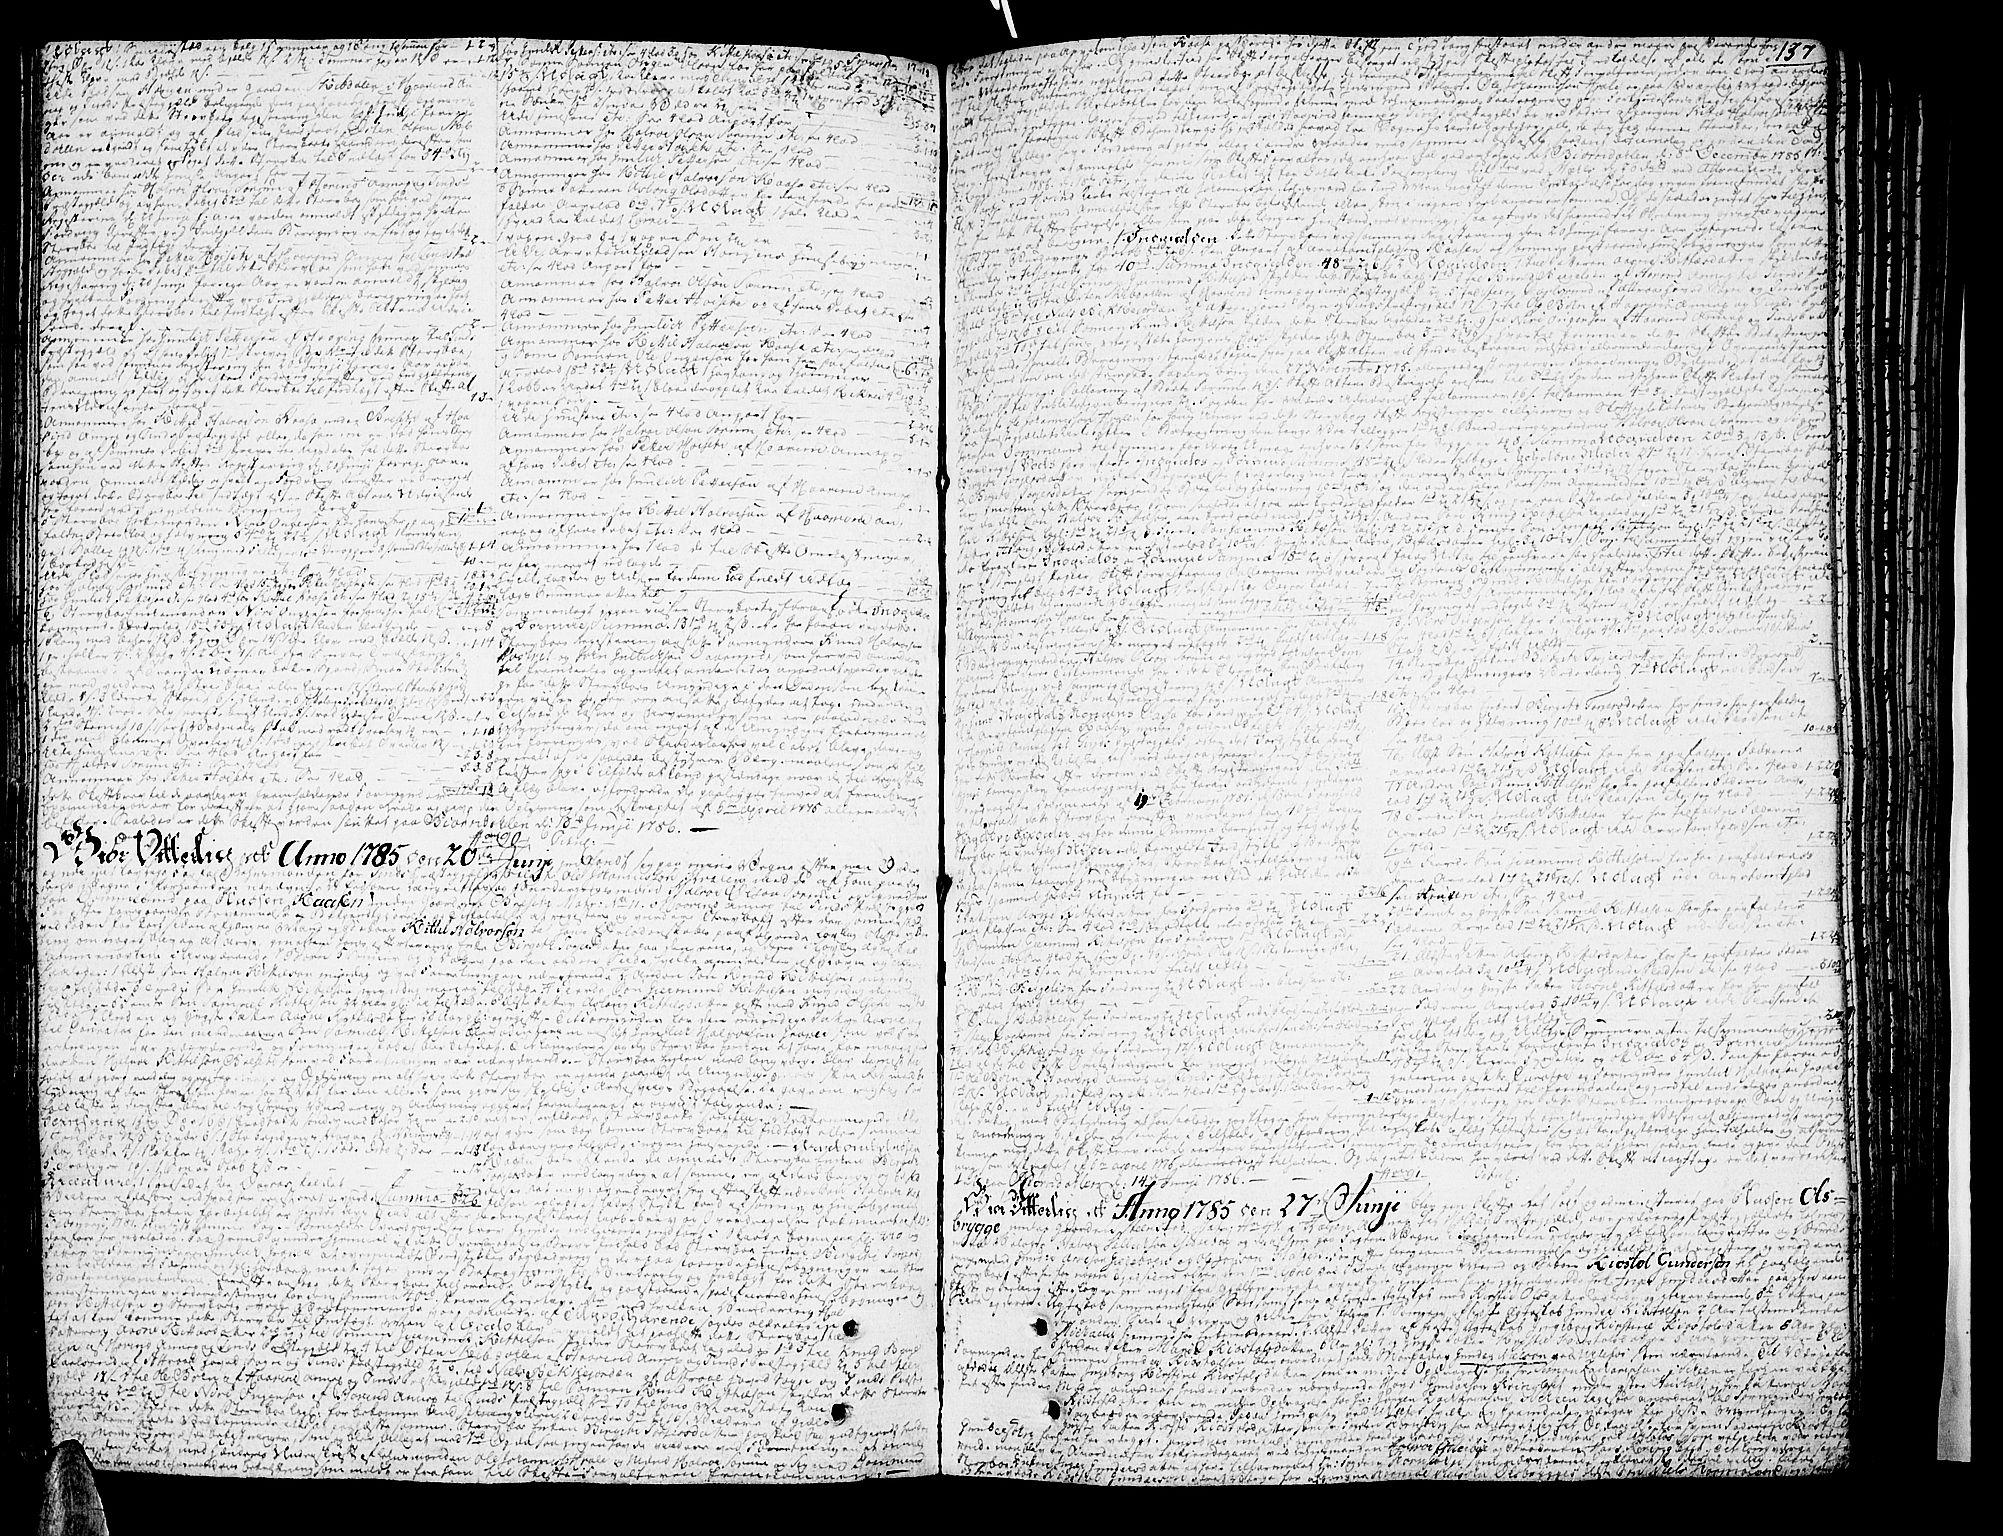 SAKO, Nedre Telemark sorenskriveri, H/Hb/Hba/L0016a: Skifteprotokoll, 1785-1792, p. 136b-137a